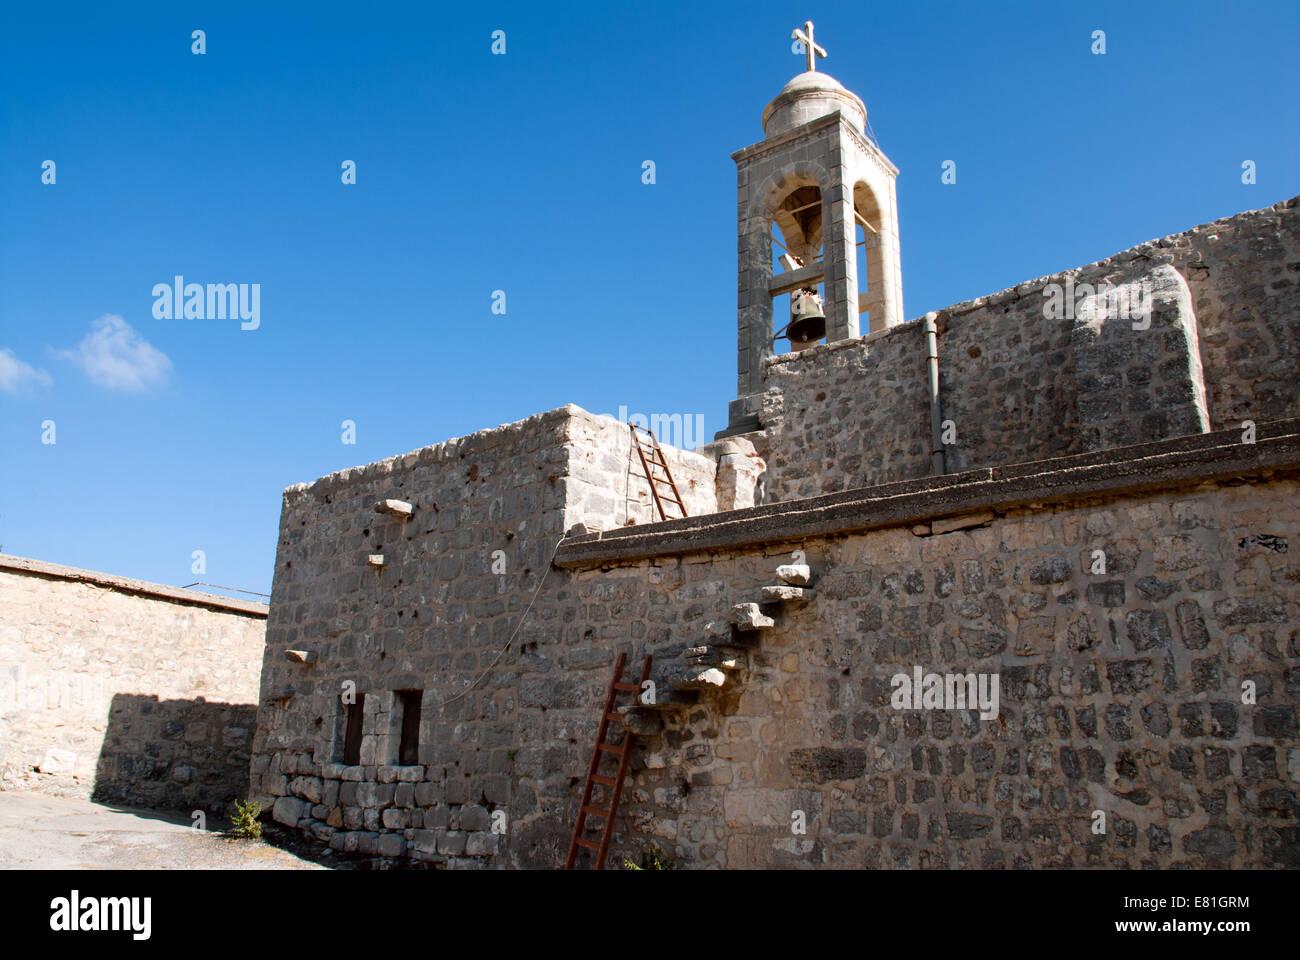 Mar Saba Church, Batroun, north Lebanon - Stock Image